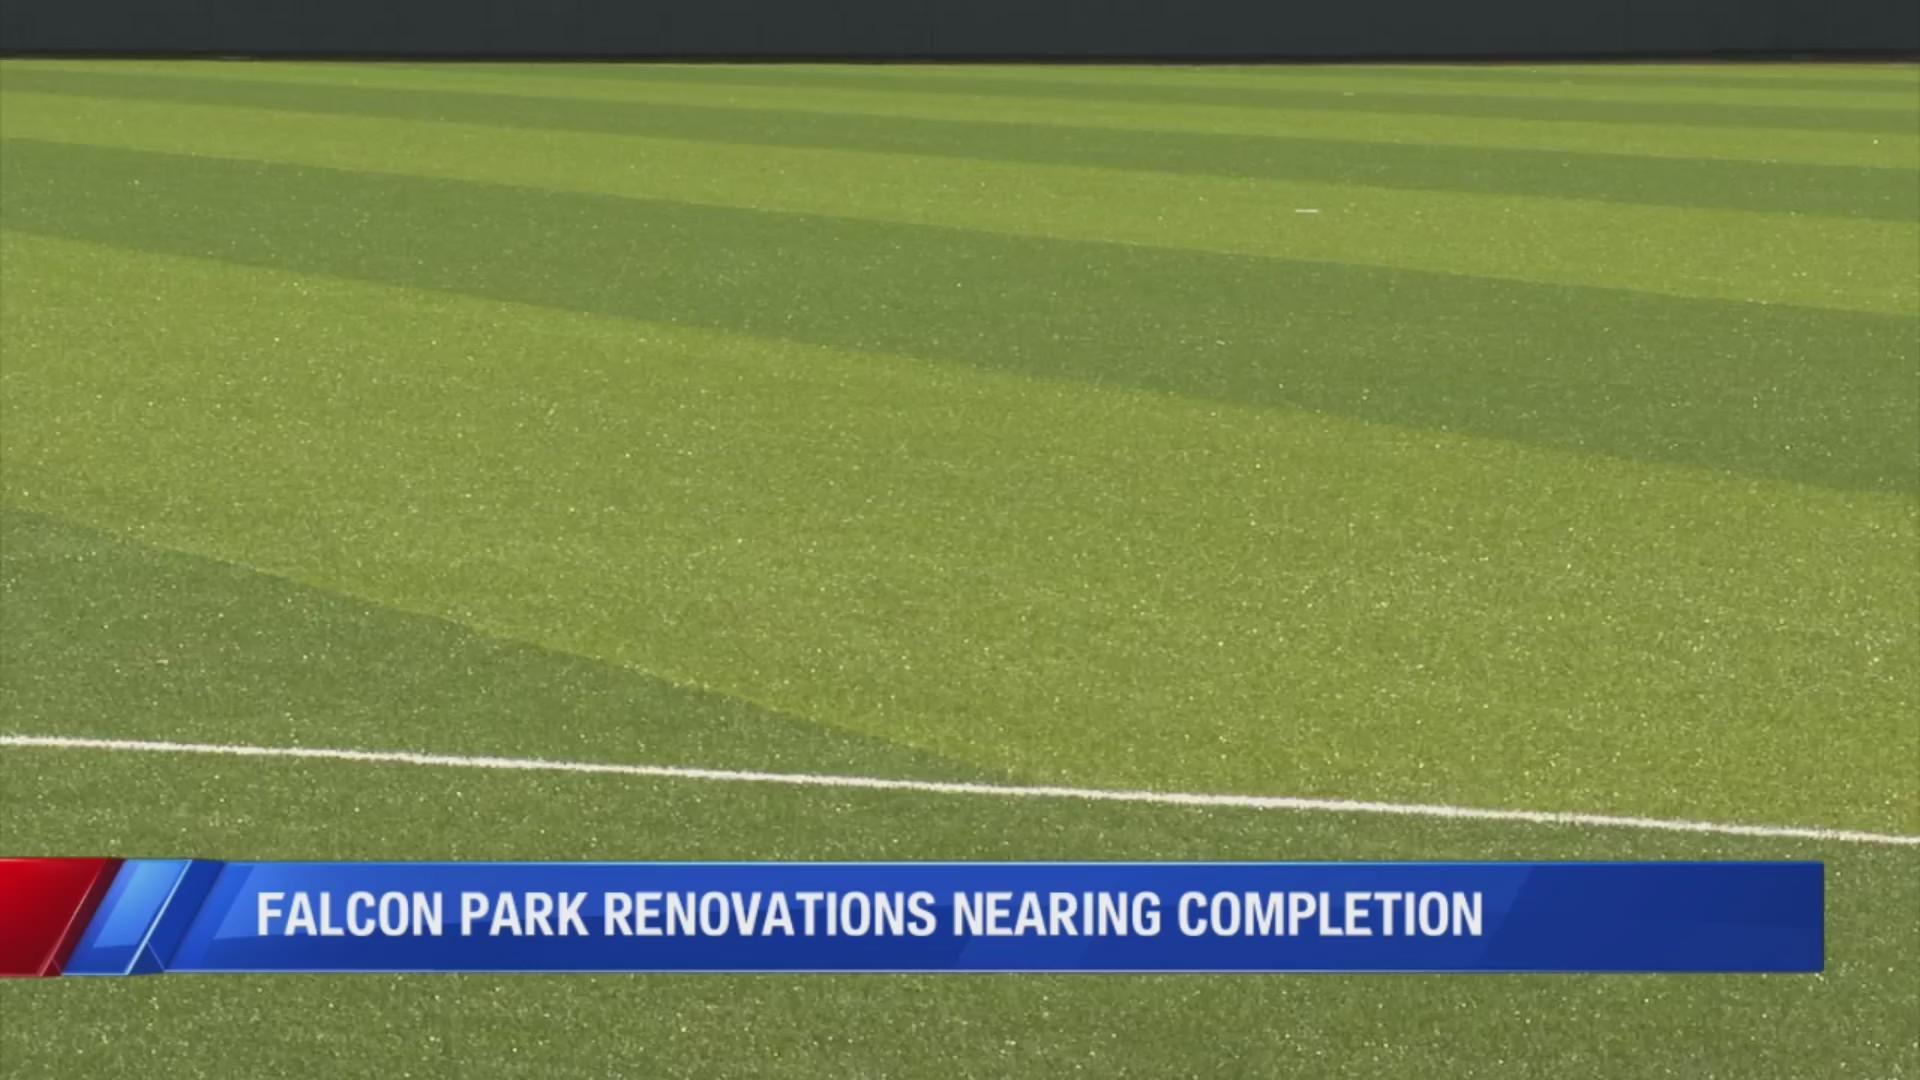 Falcon_Park_Renovations_Nearing_Completi_0_20190522135418